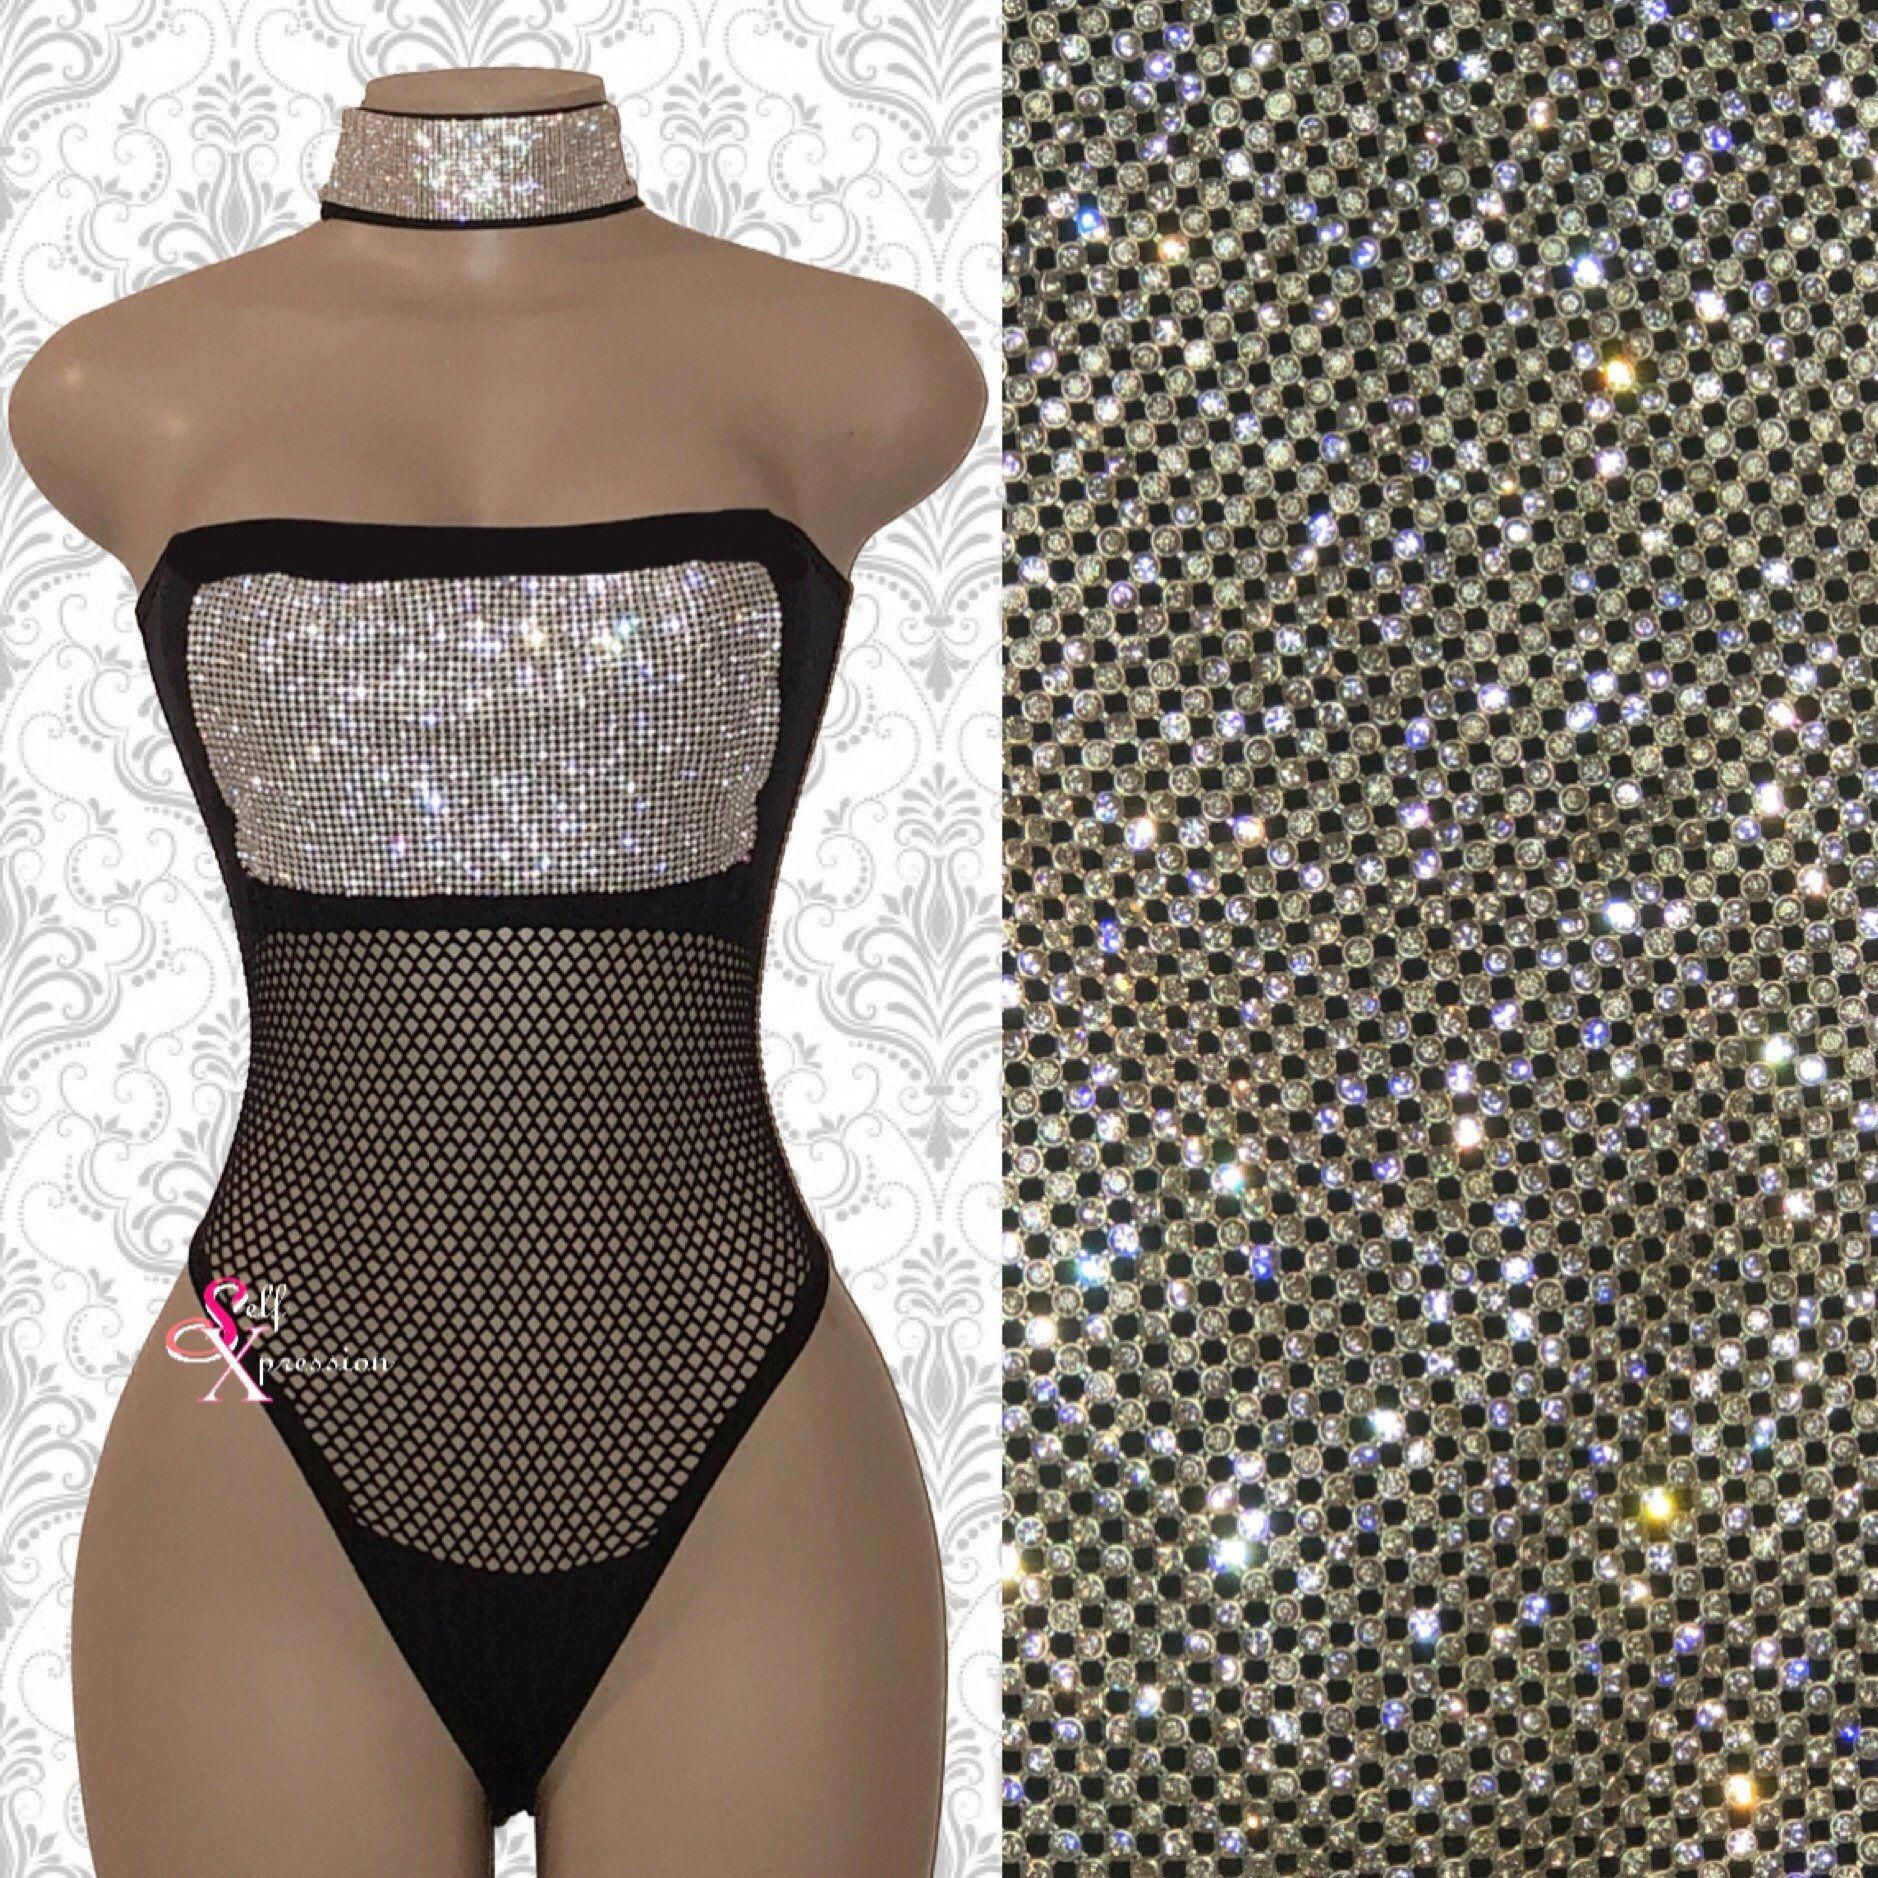 Strapless Fetish Dancewear Tube Bodysuit Choker fishnet erotic wear exotic  sexy lingerie Vixen stripper outfit ravewear Rhinestone #womensoutfits